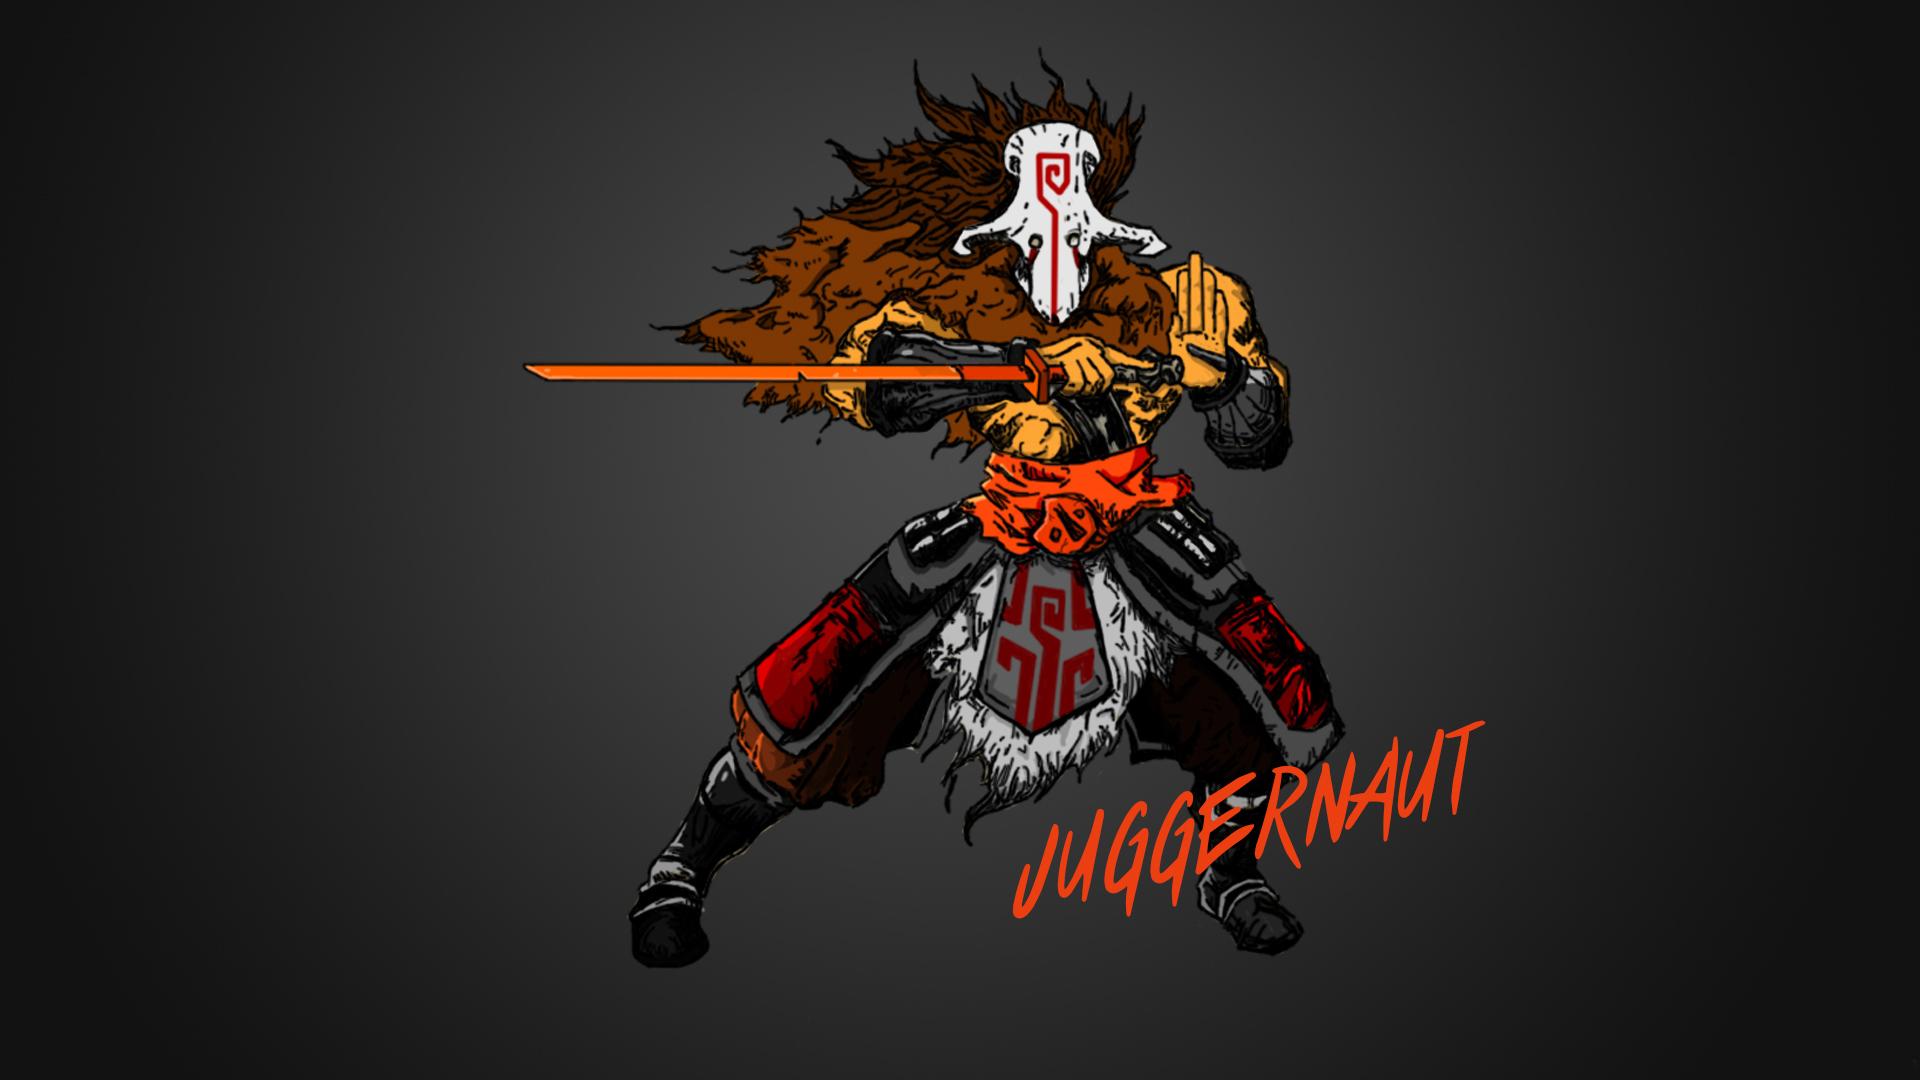 yurnero juggernaut dota 2 hd wallpaper hero image picture 1920x1080 2a    Juggernaut Dota 2